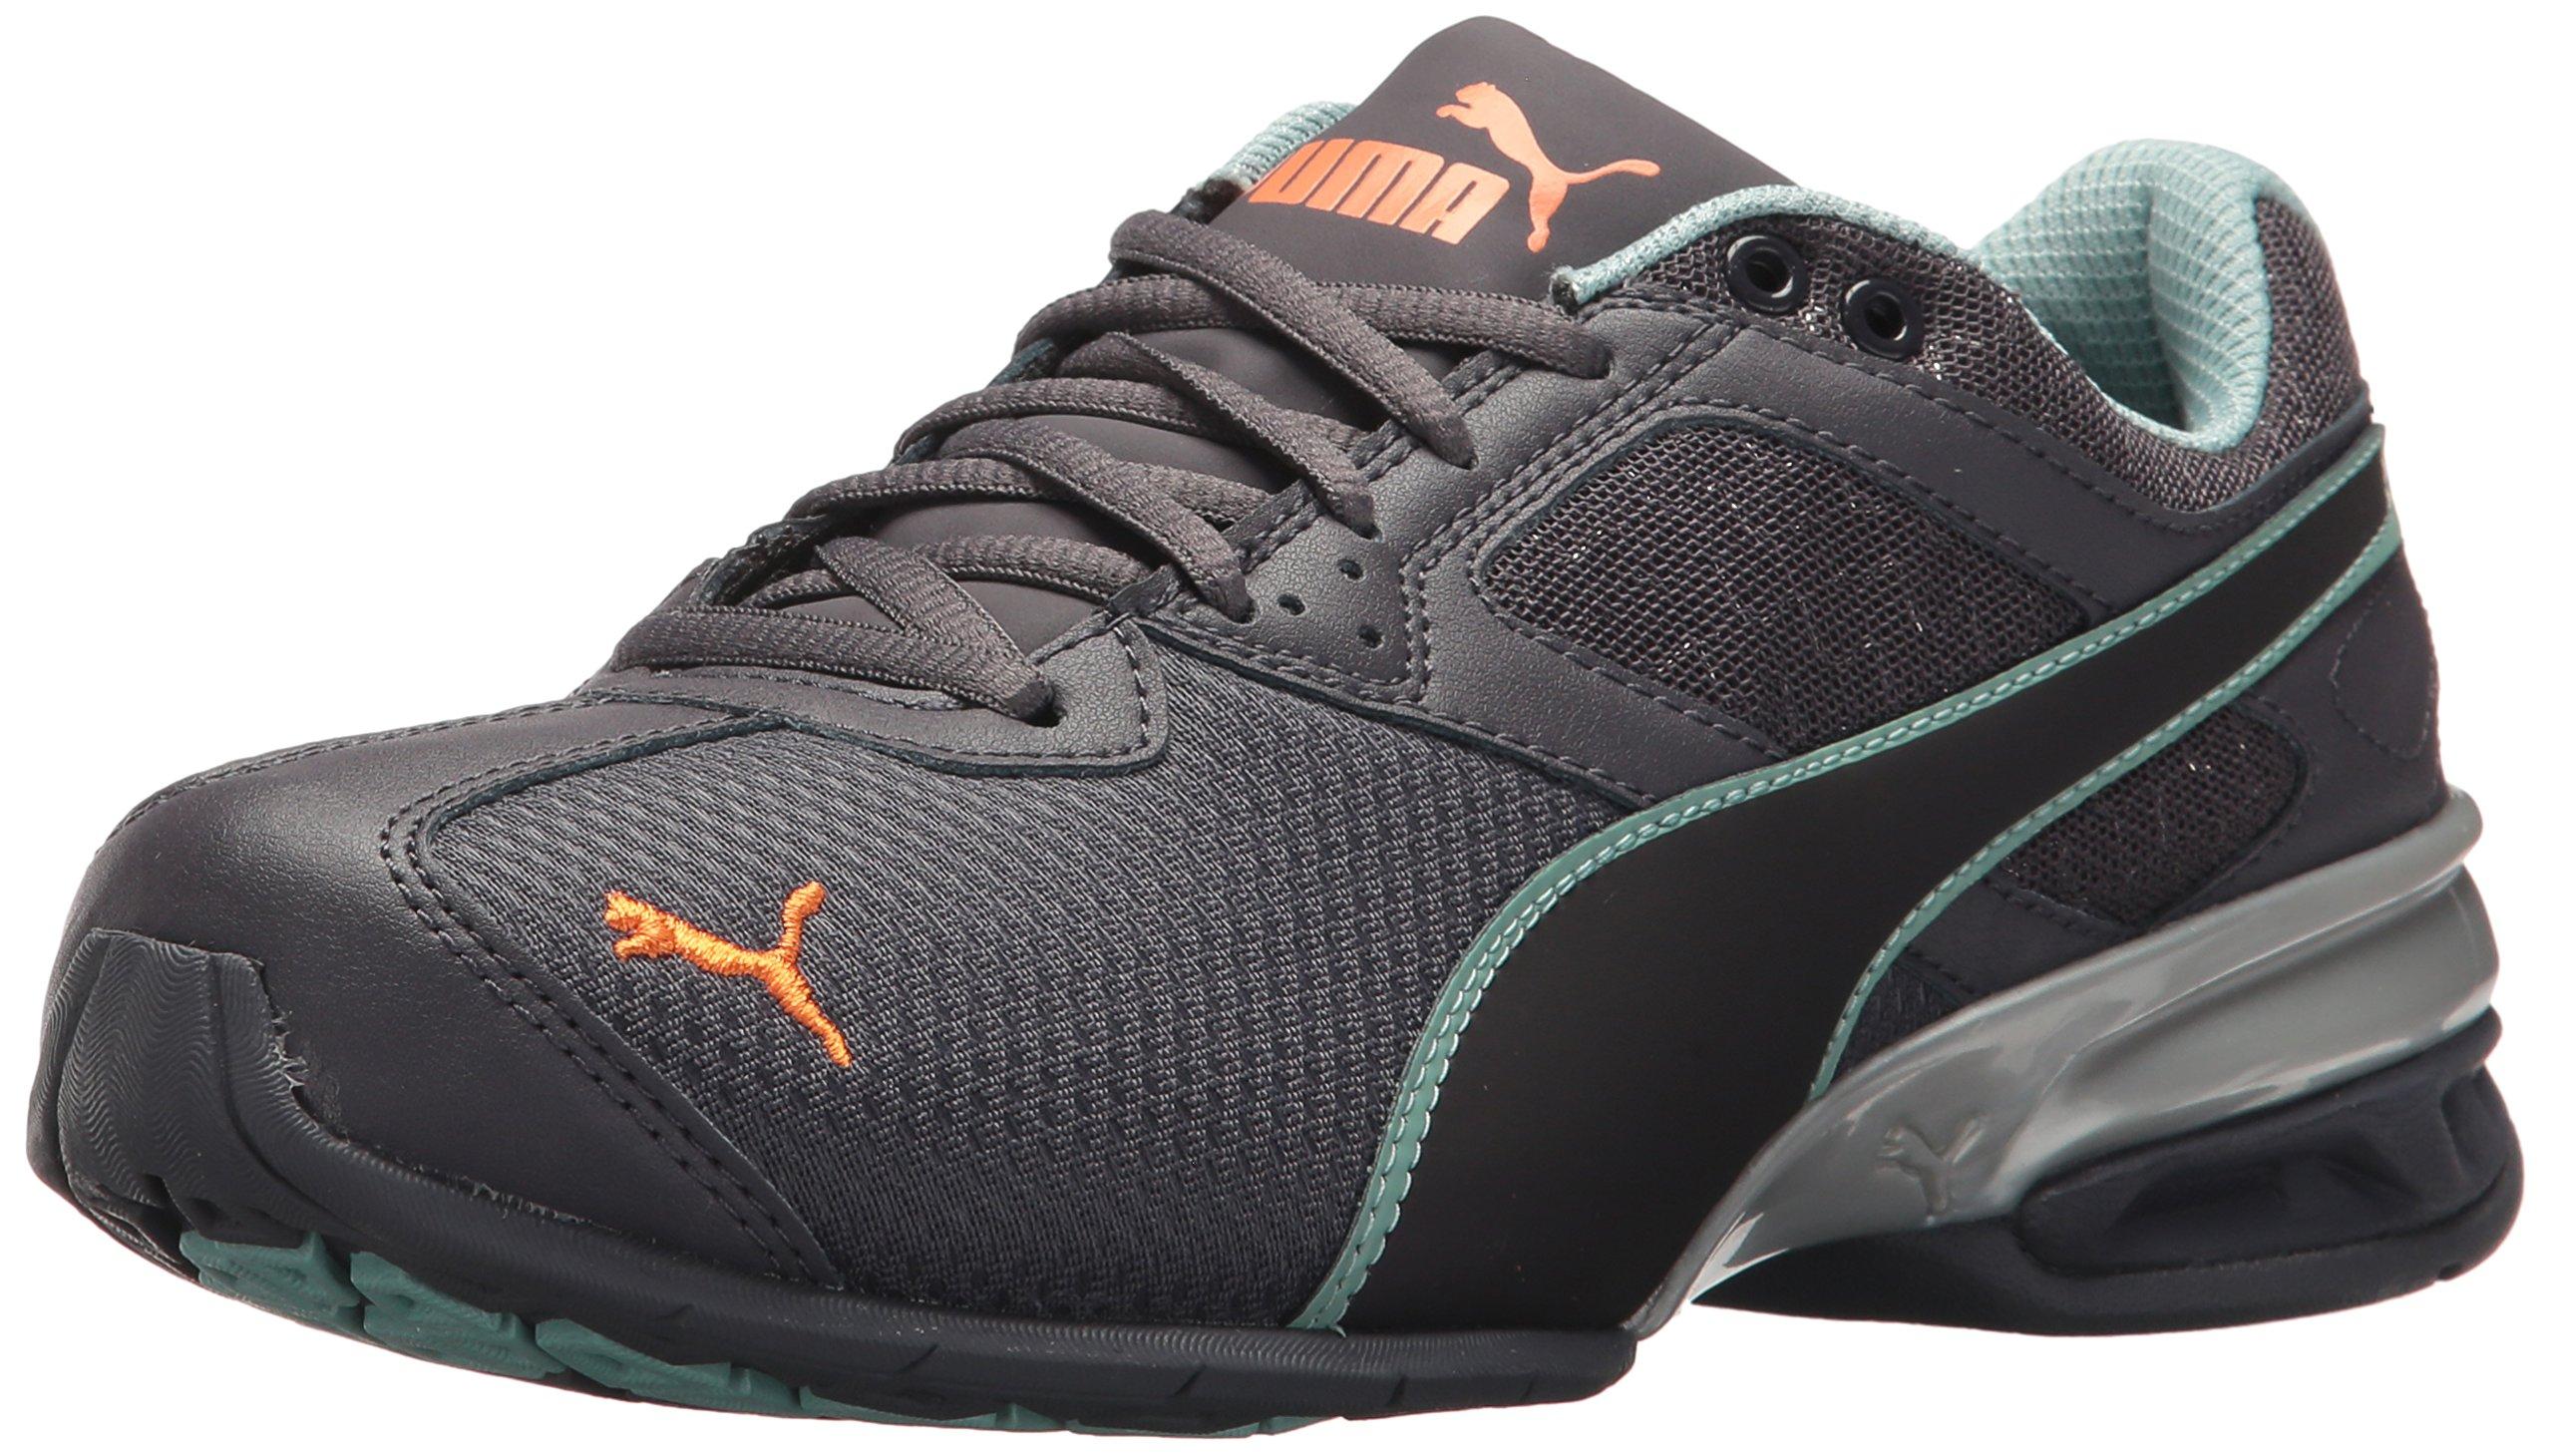 PUMA Women's Tazon 6 Metallic Wn Sneaker, Periscope-Aquifer-Melon, 6.5 M US